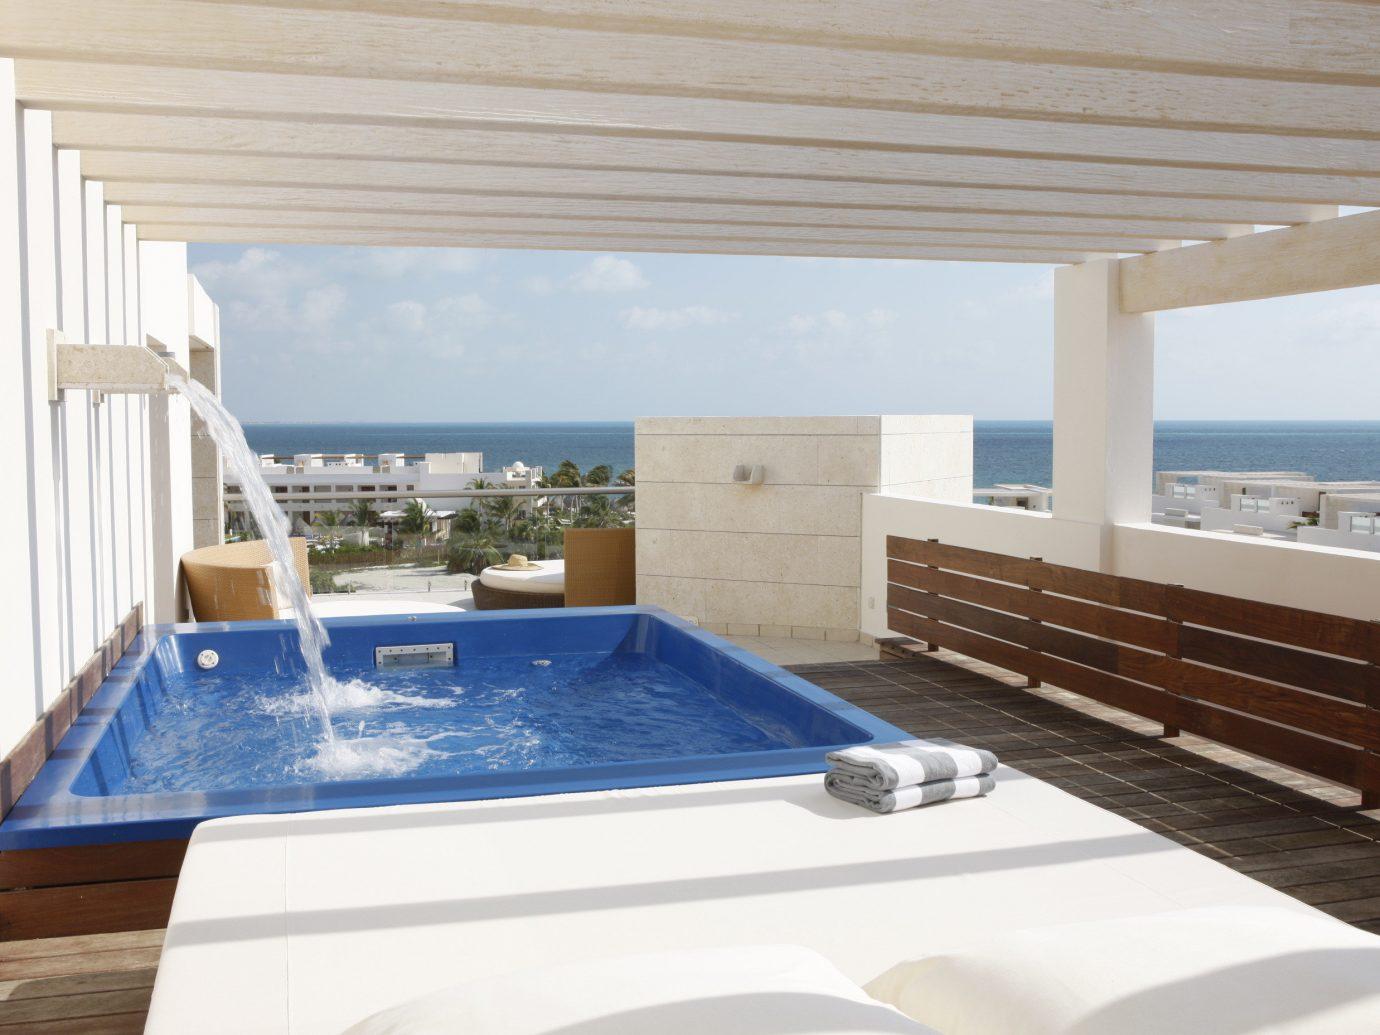 All-Inclusive Resorts Hotels Romance swimming pool property room window jacuzzi Villa interior design estate real estate daylighting apartment Deck tub